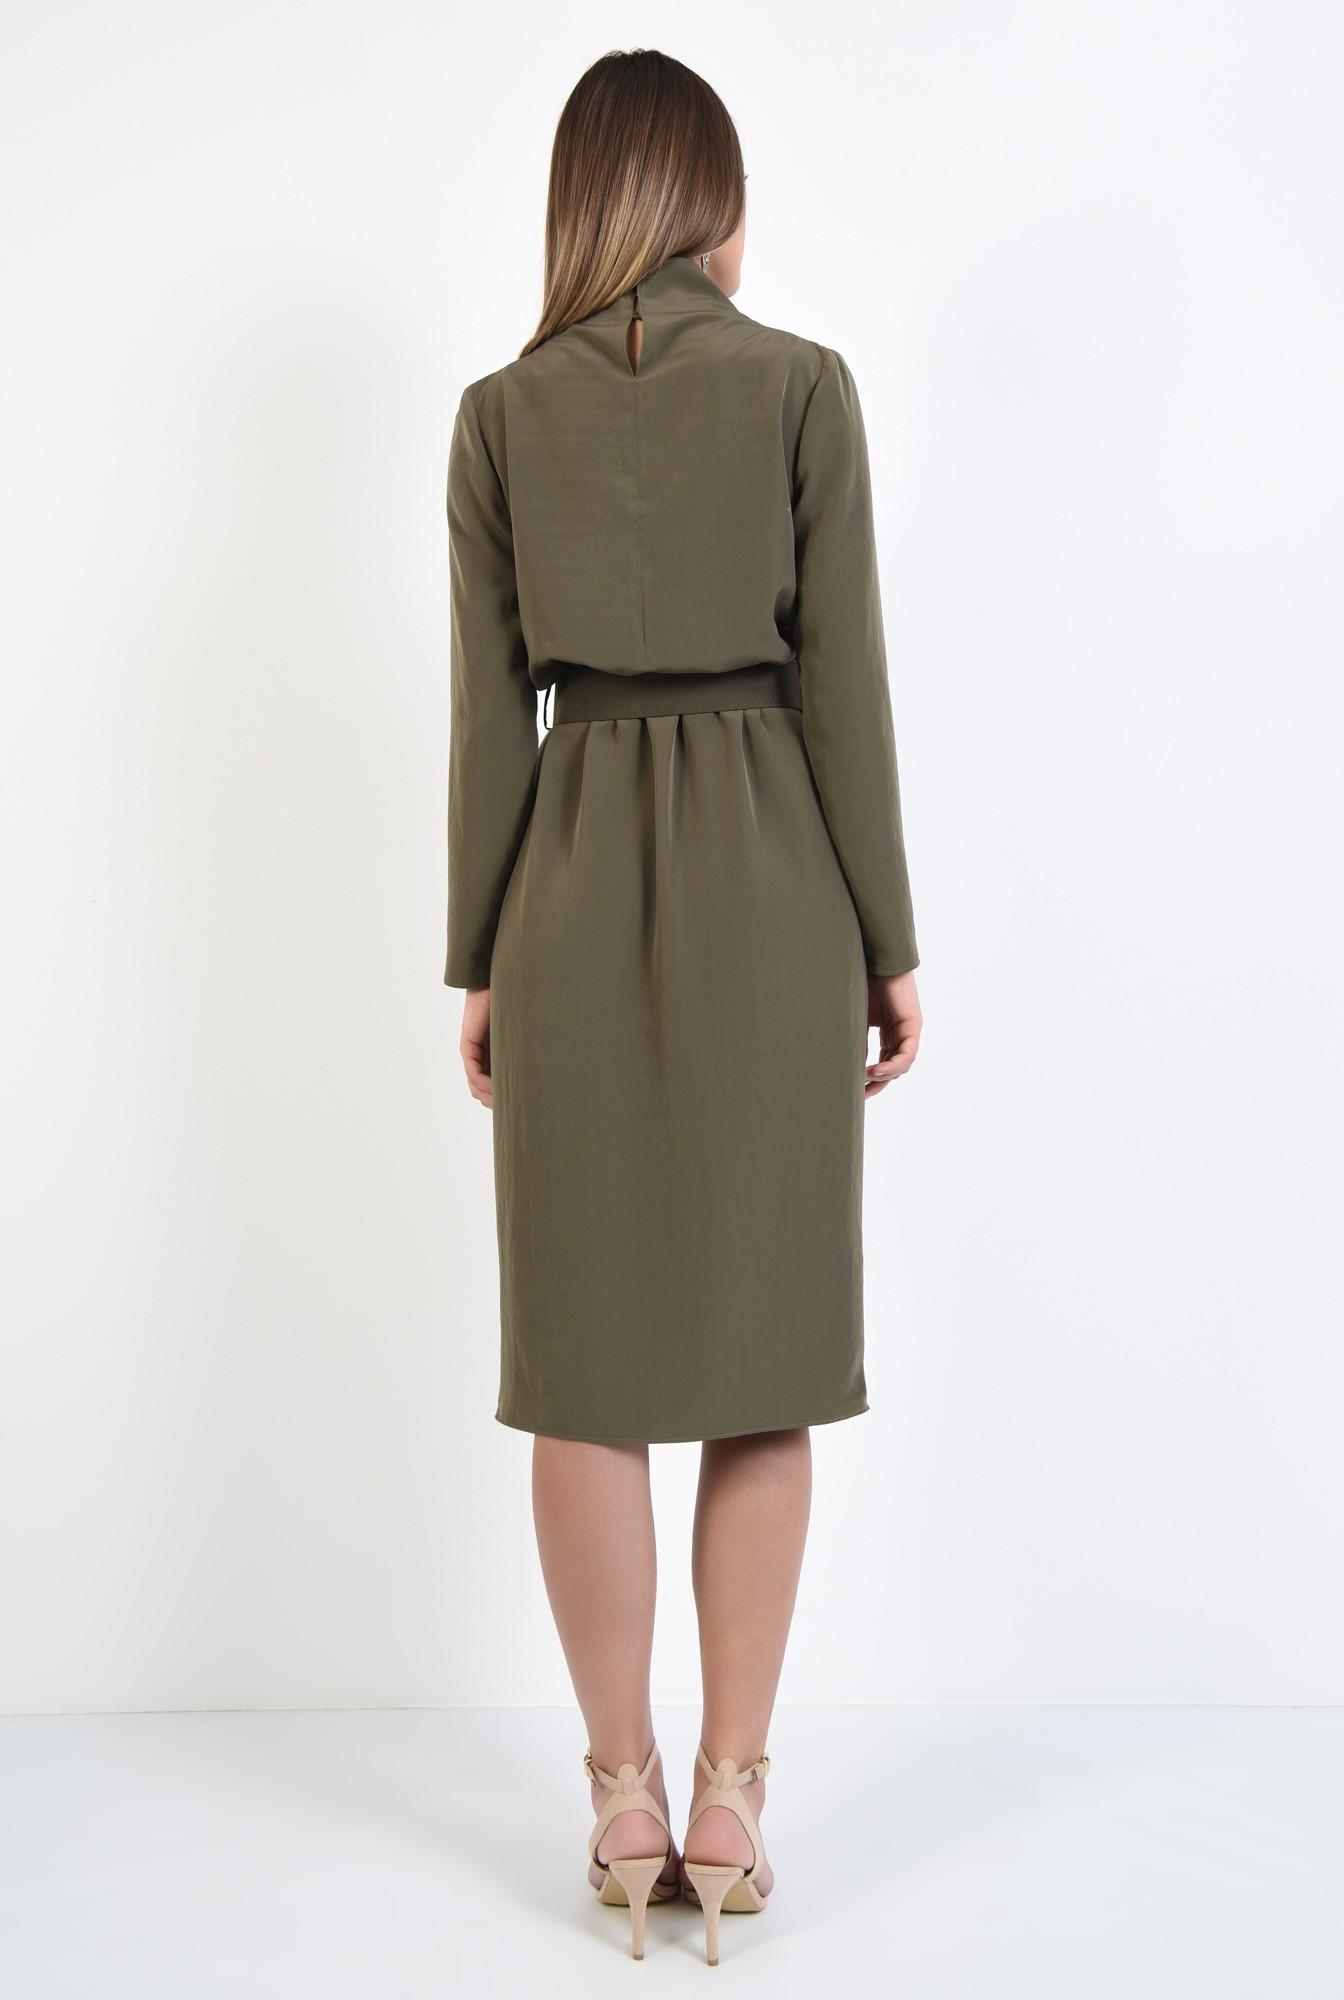 1 - rochie eleganta, de zi, verde, kaki, cu curea, maneci lungi